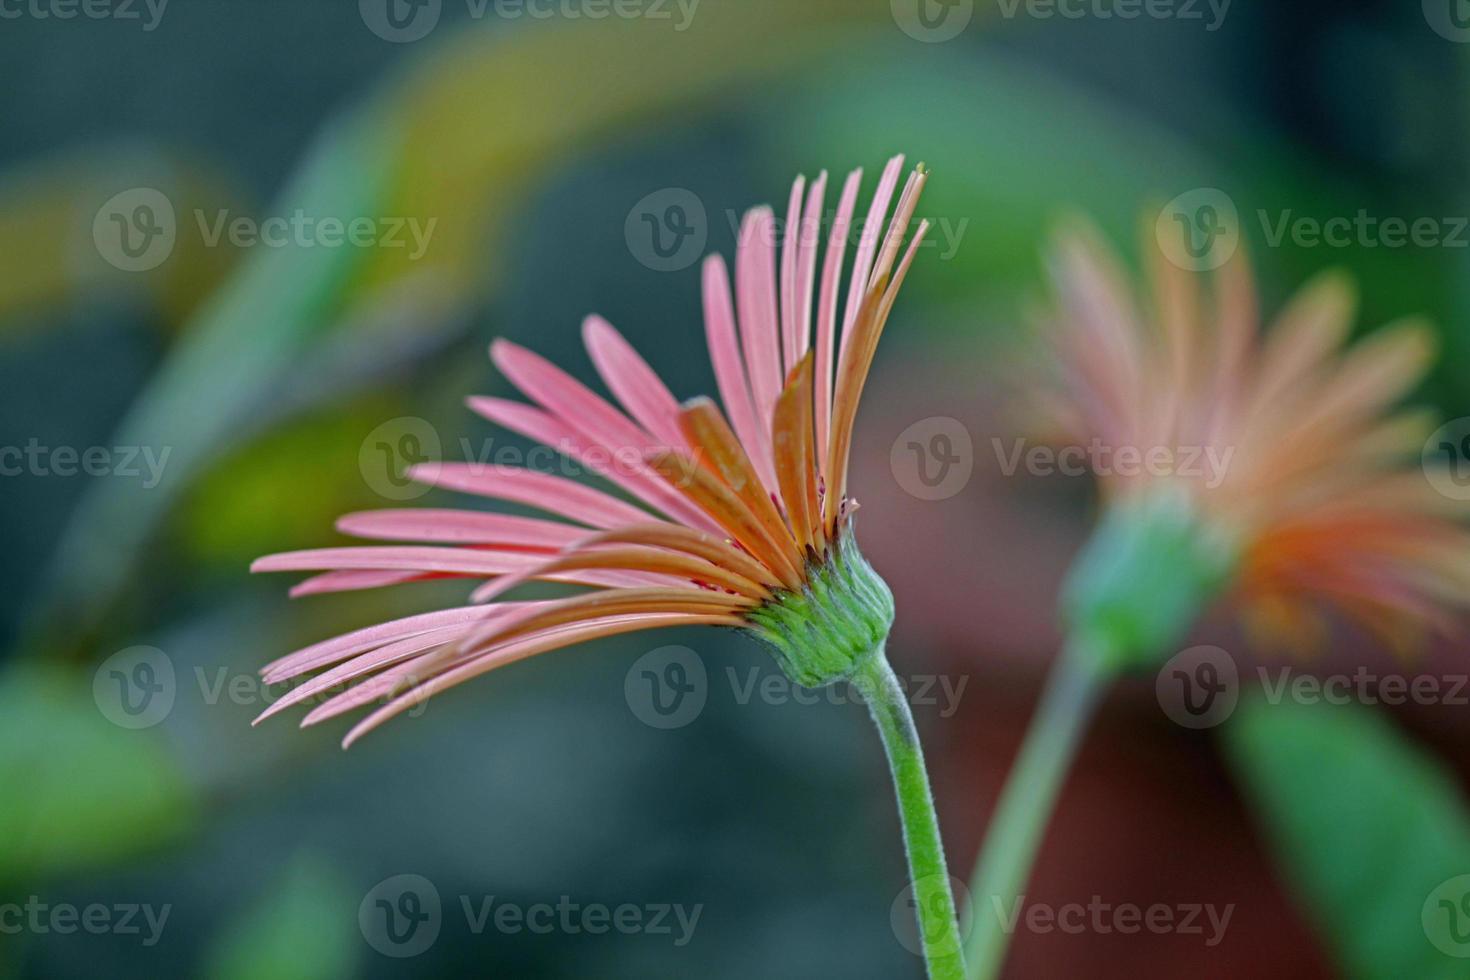 swan river daisy, brachycome lberidifolia foto